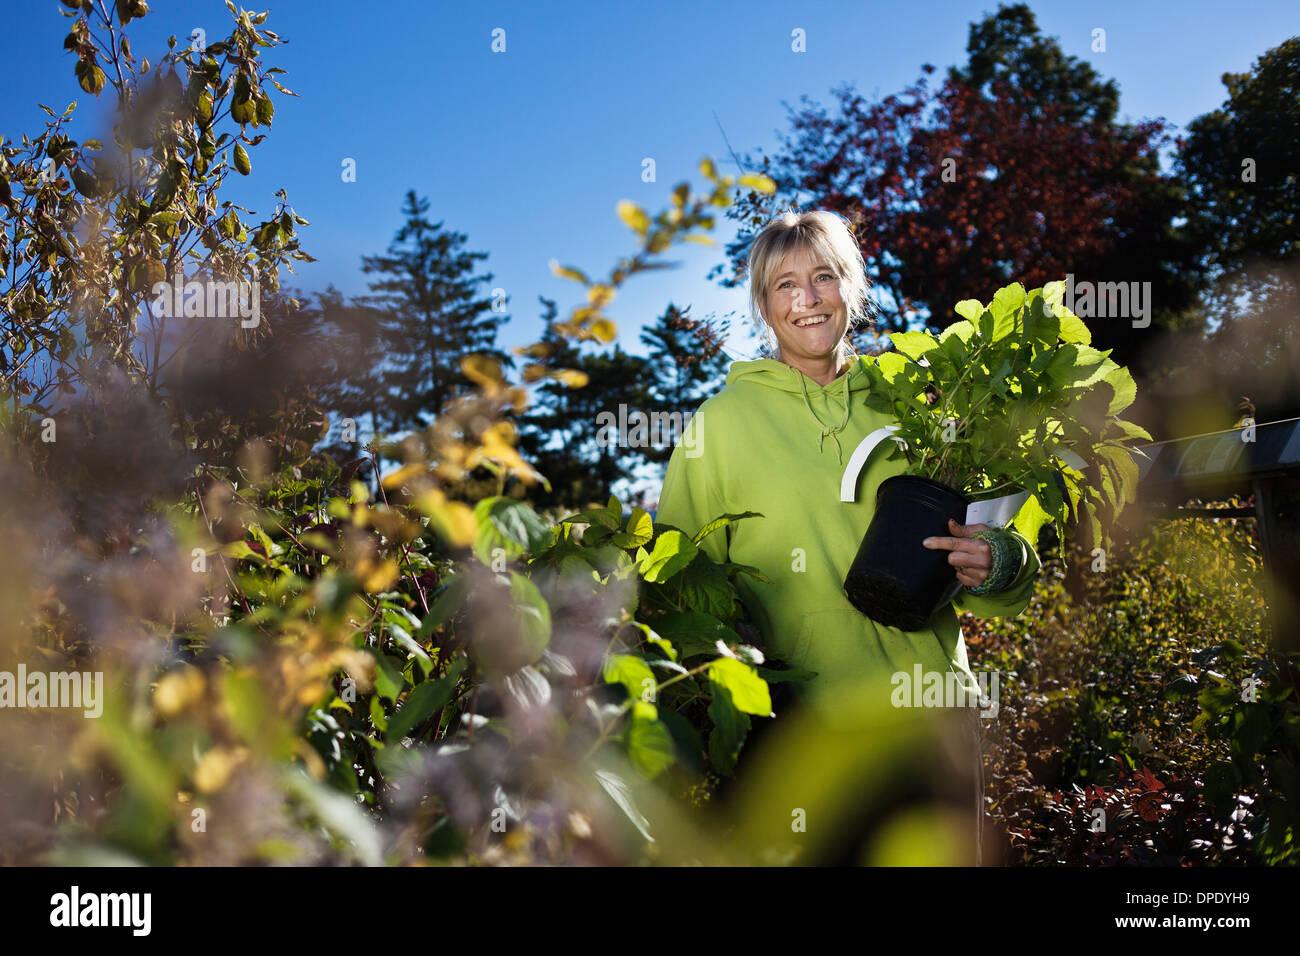 Mid adult woman gardening - Stock Image